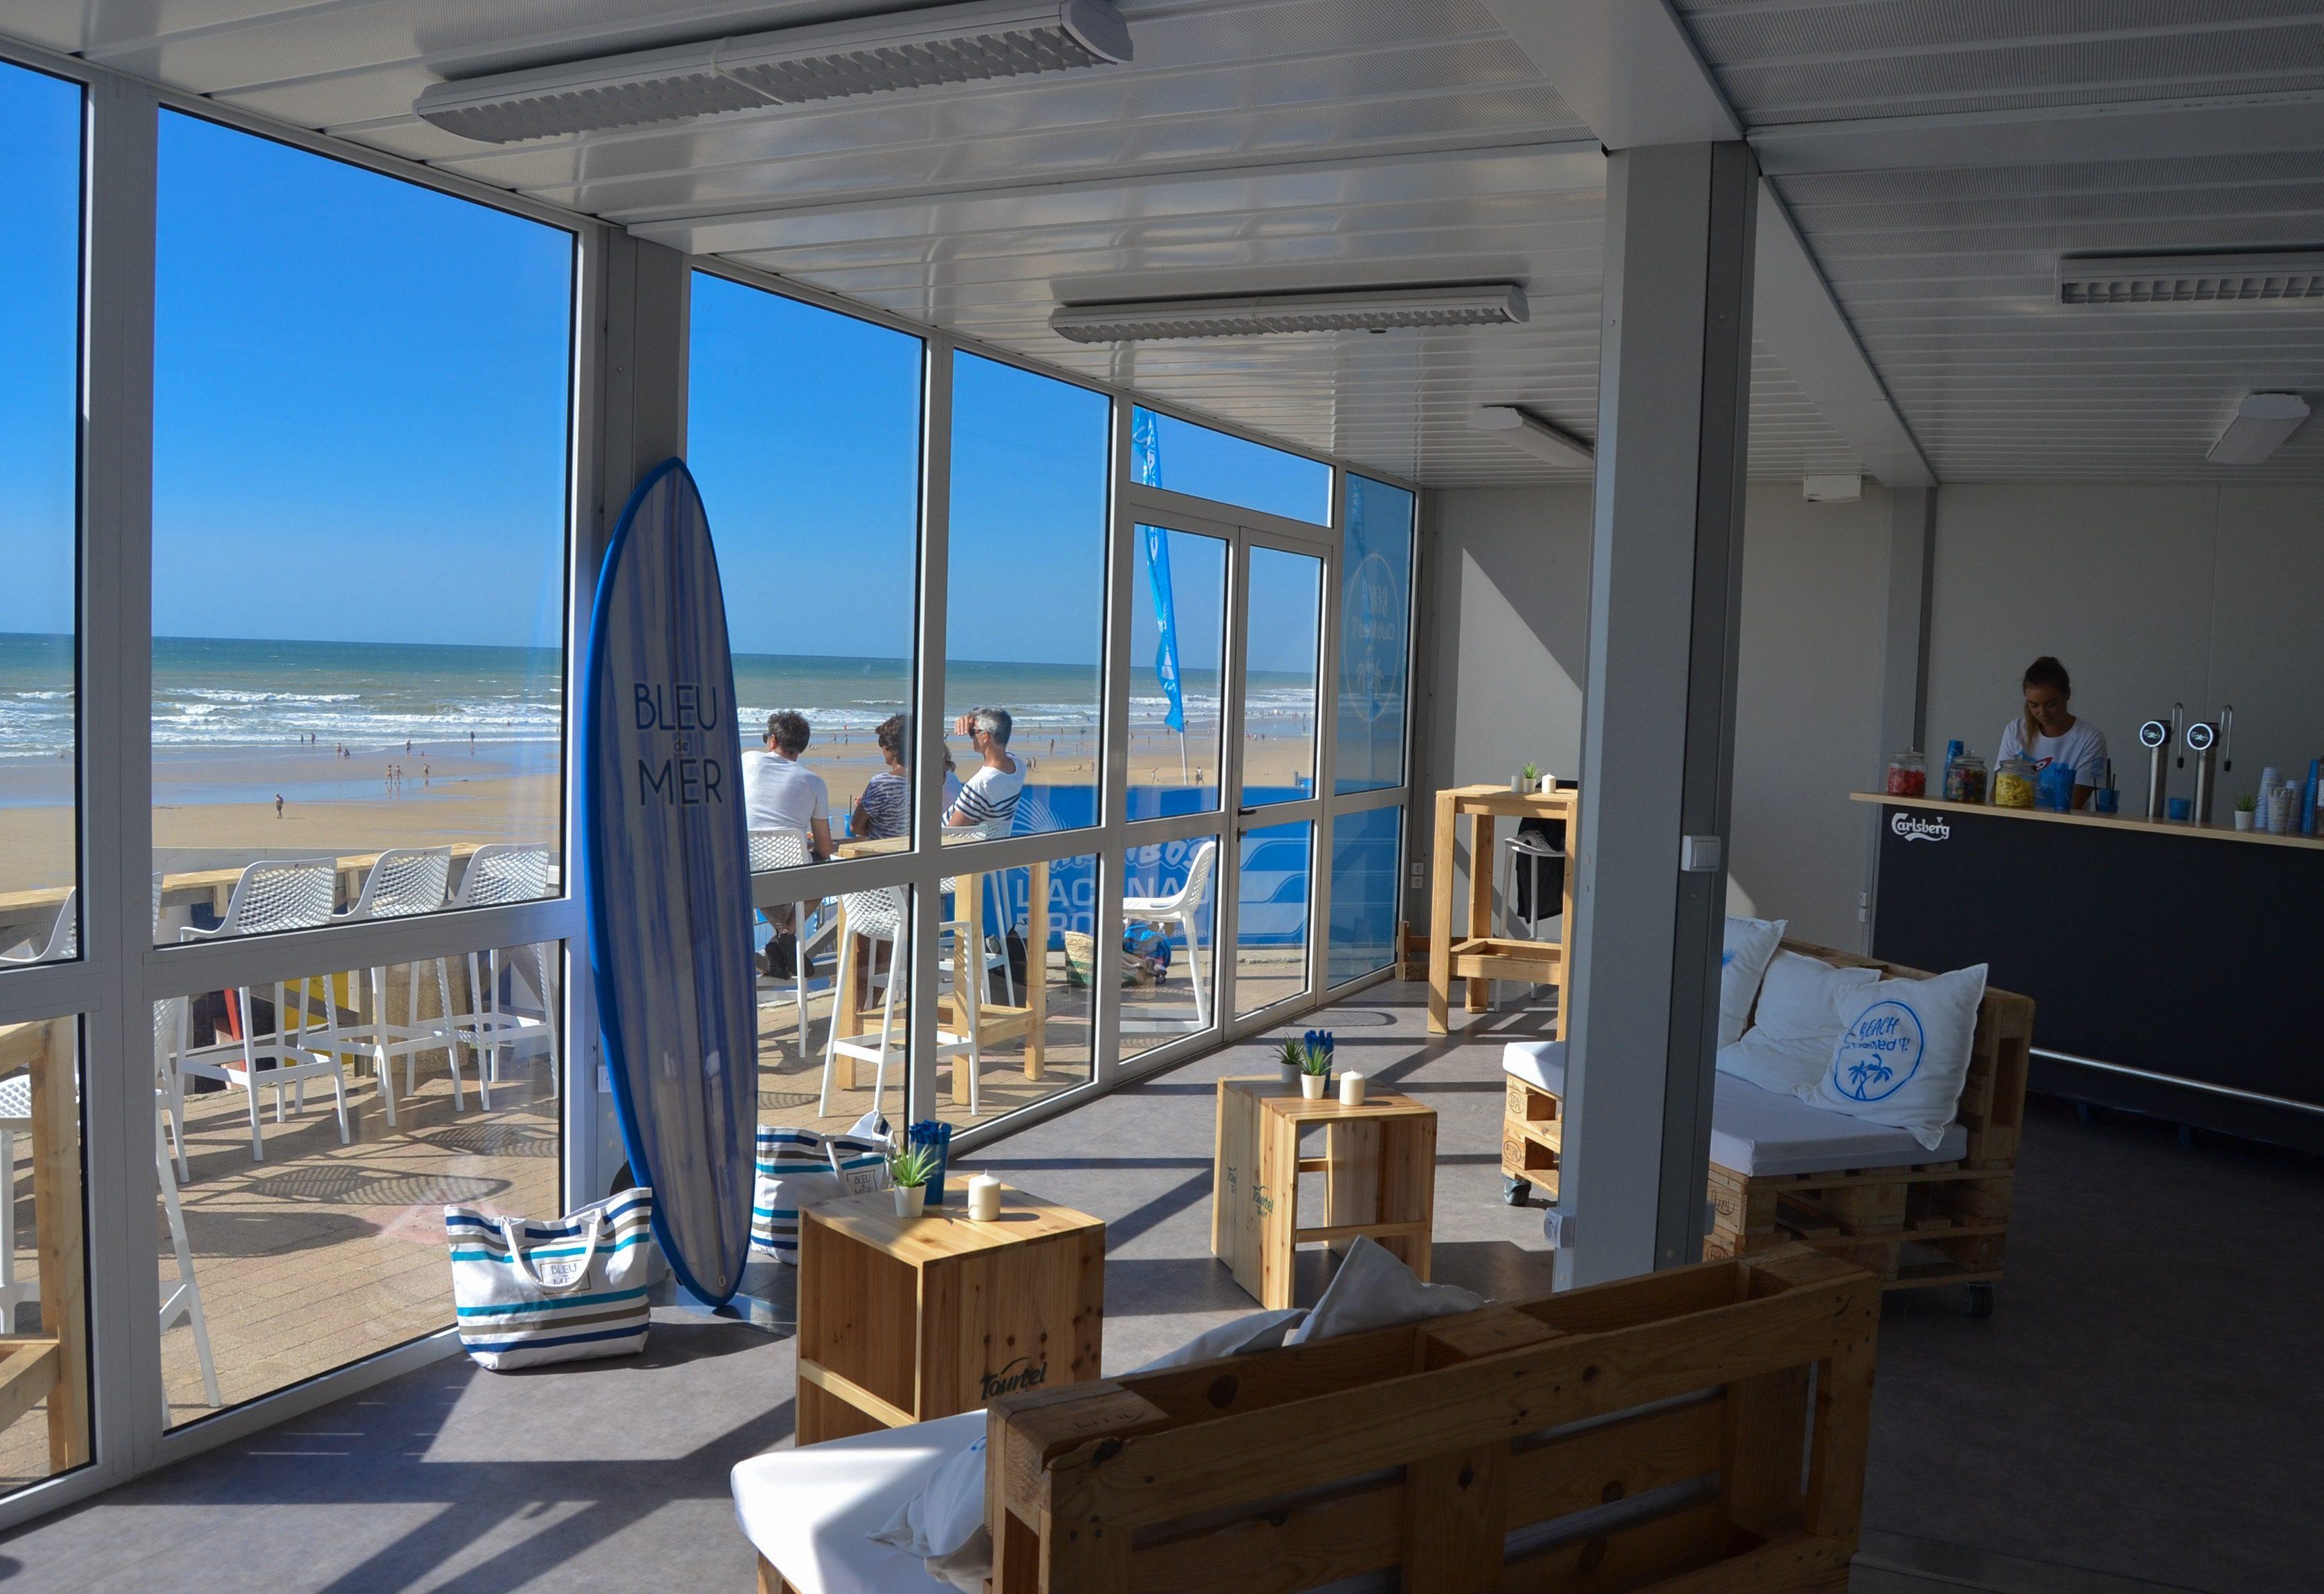 caraibos-lacanau-pro-surf-blog-voyage-les-ptits-touristes-wsl-beach-club-med